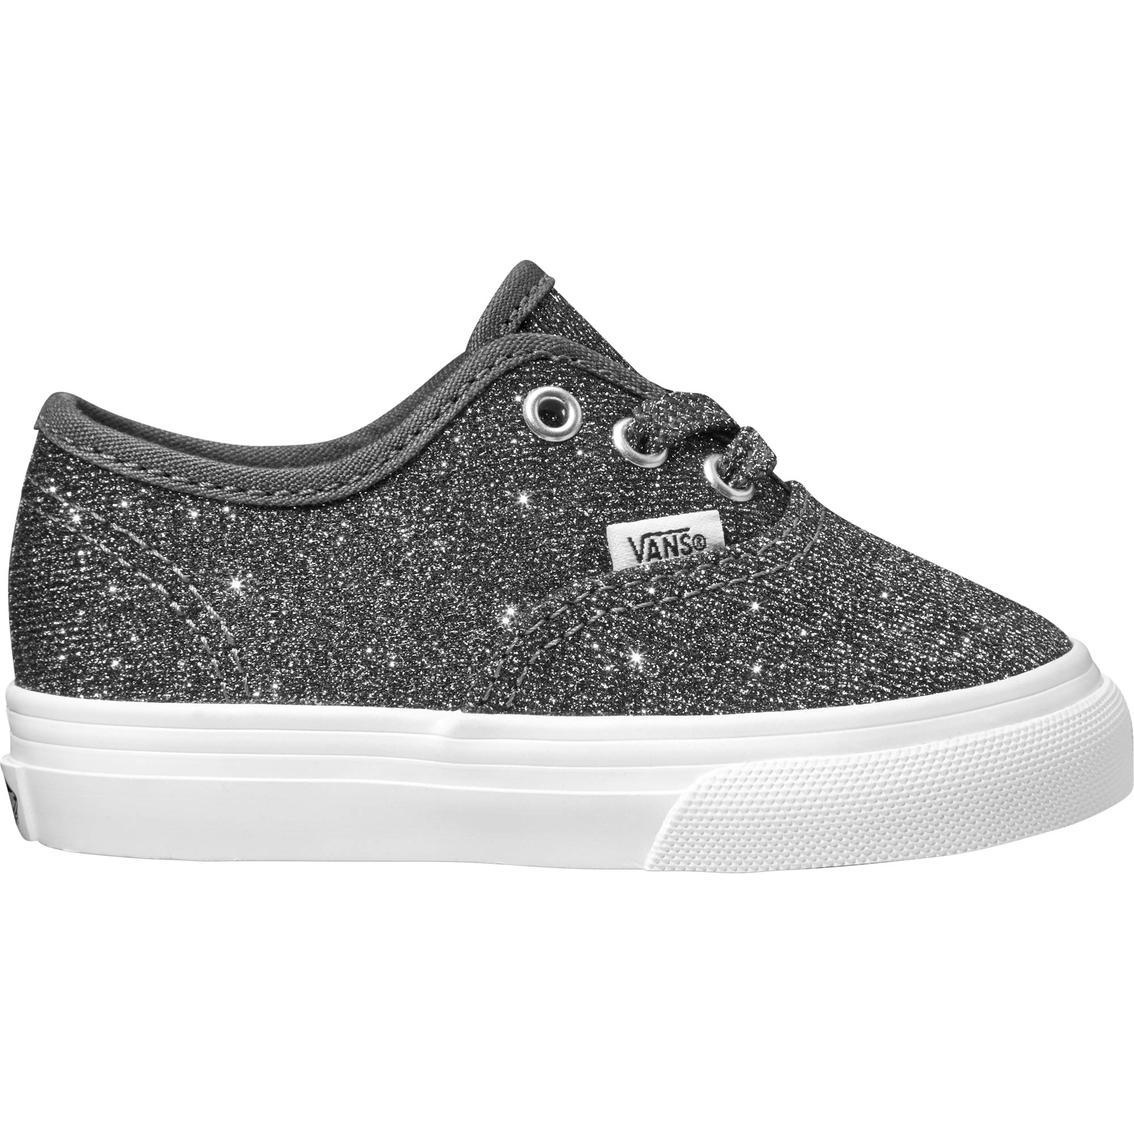 eb3a223591b230 Vans Girls Lurex Glitter Authentic